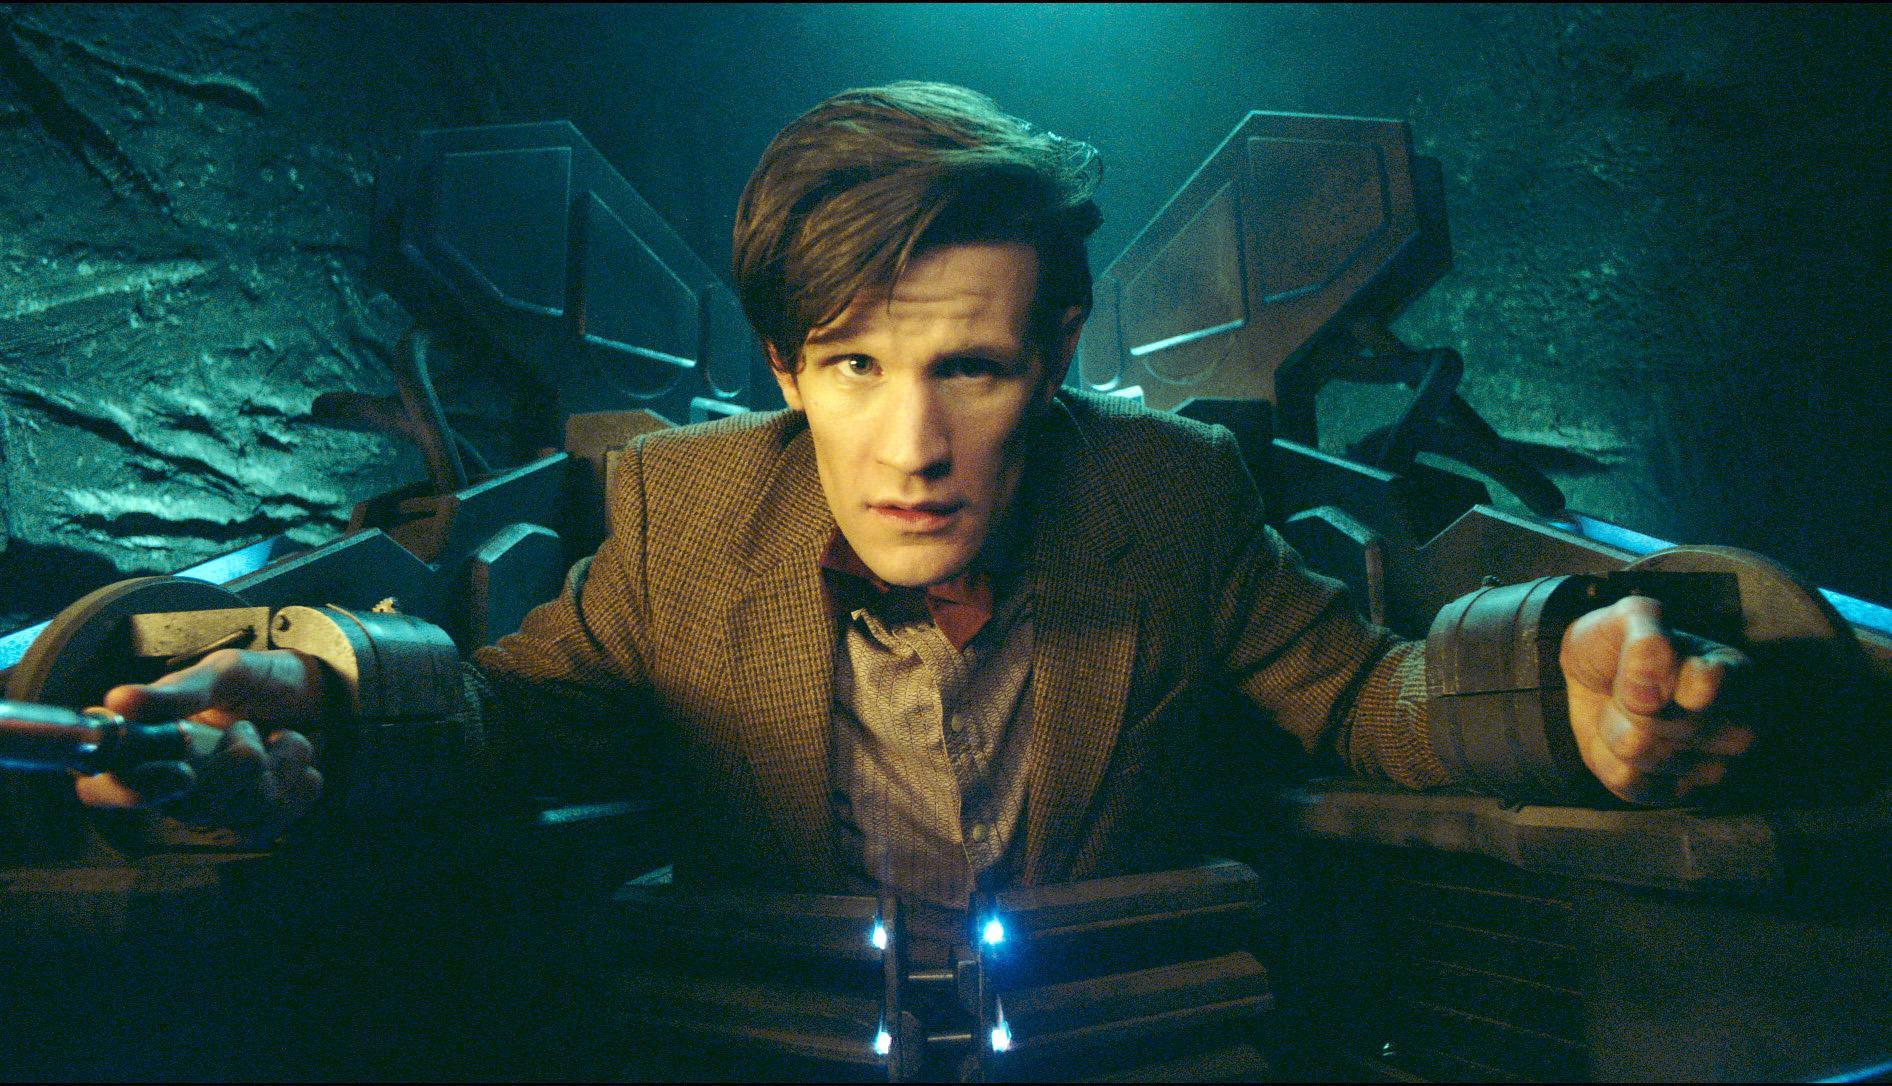 Eleventh Doctor - Matt Smith